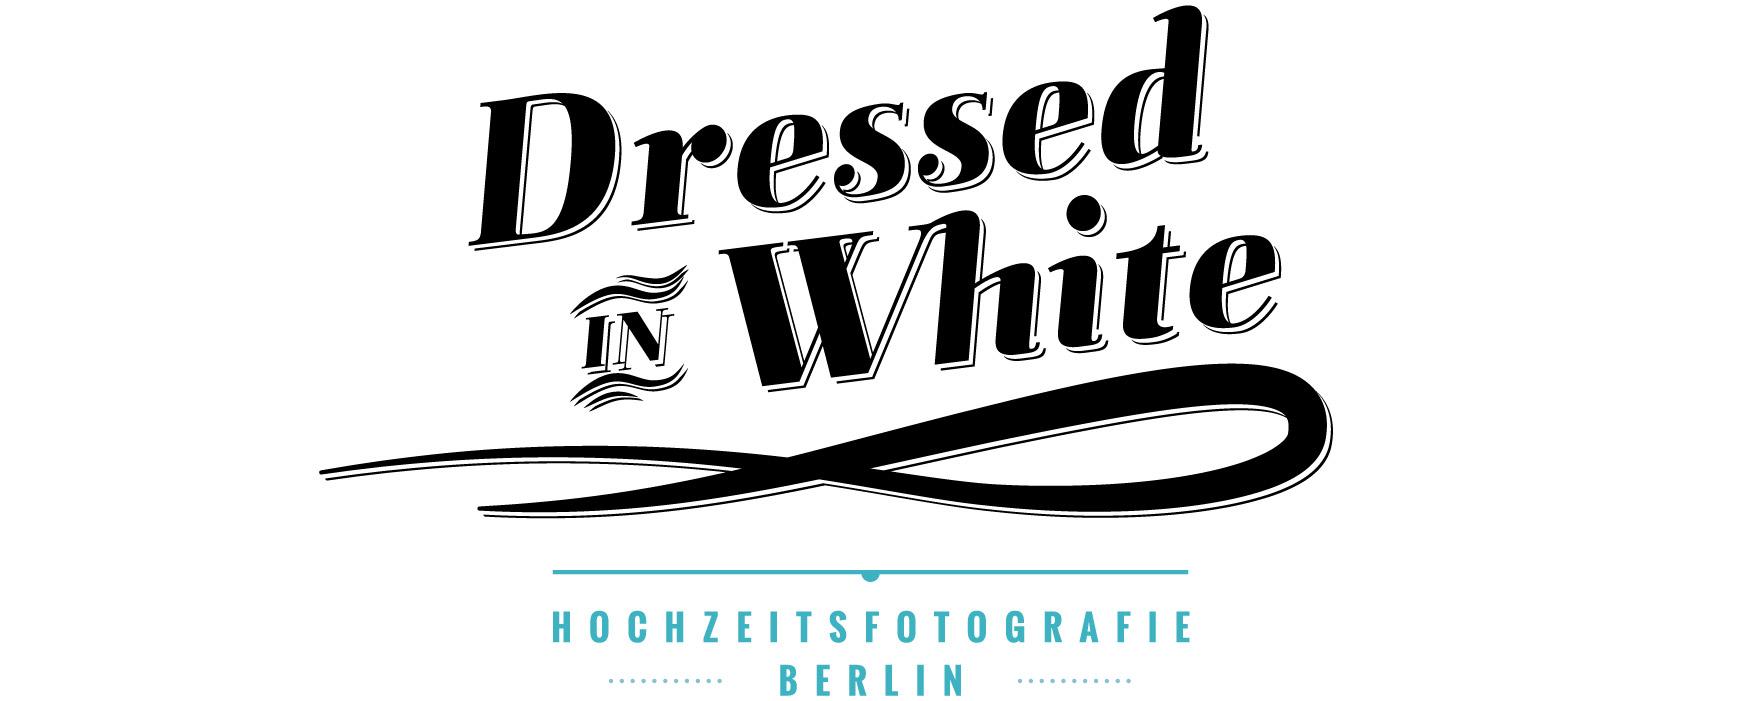 dressed in white hochzeitsfotograf berlin. Black Bedroom Furniture Sets. Home Design Ideas